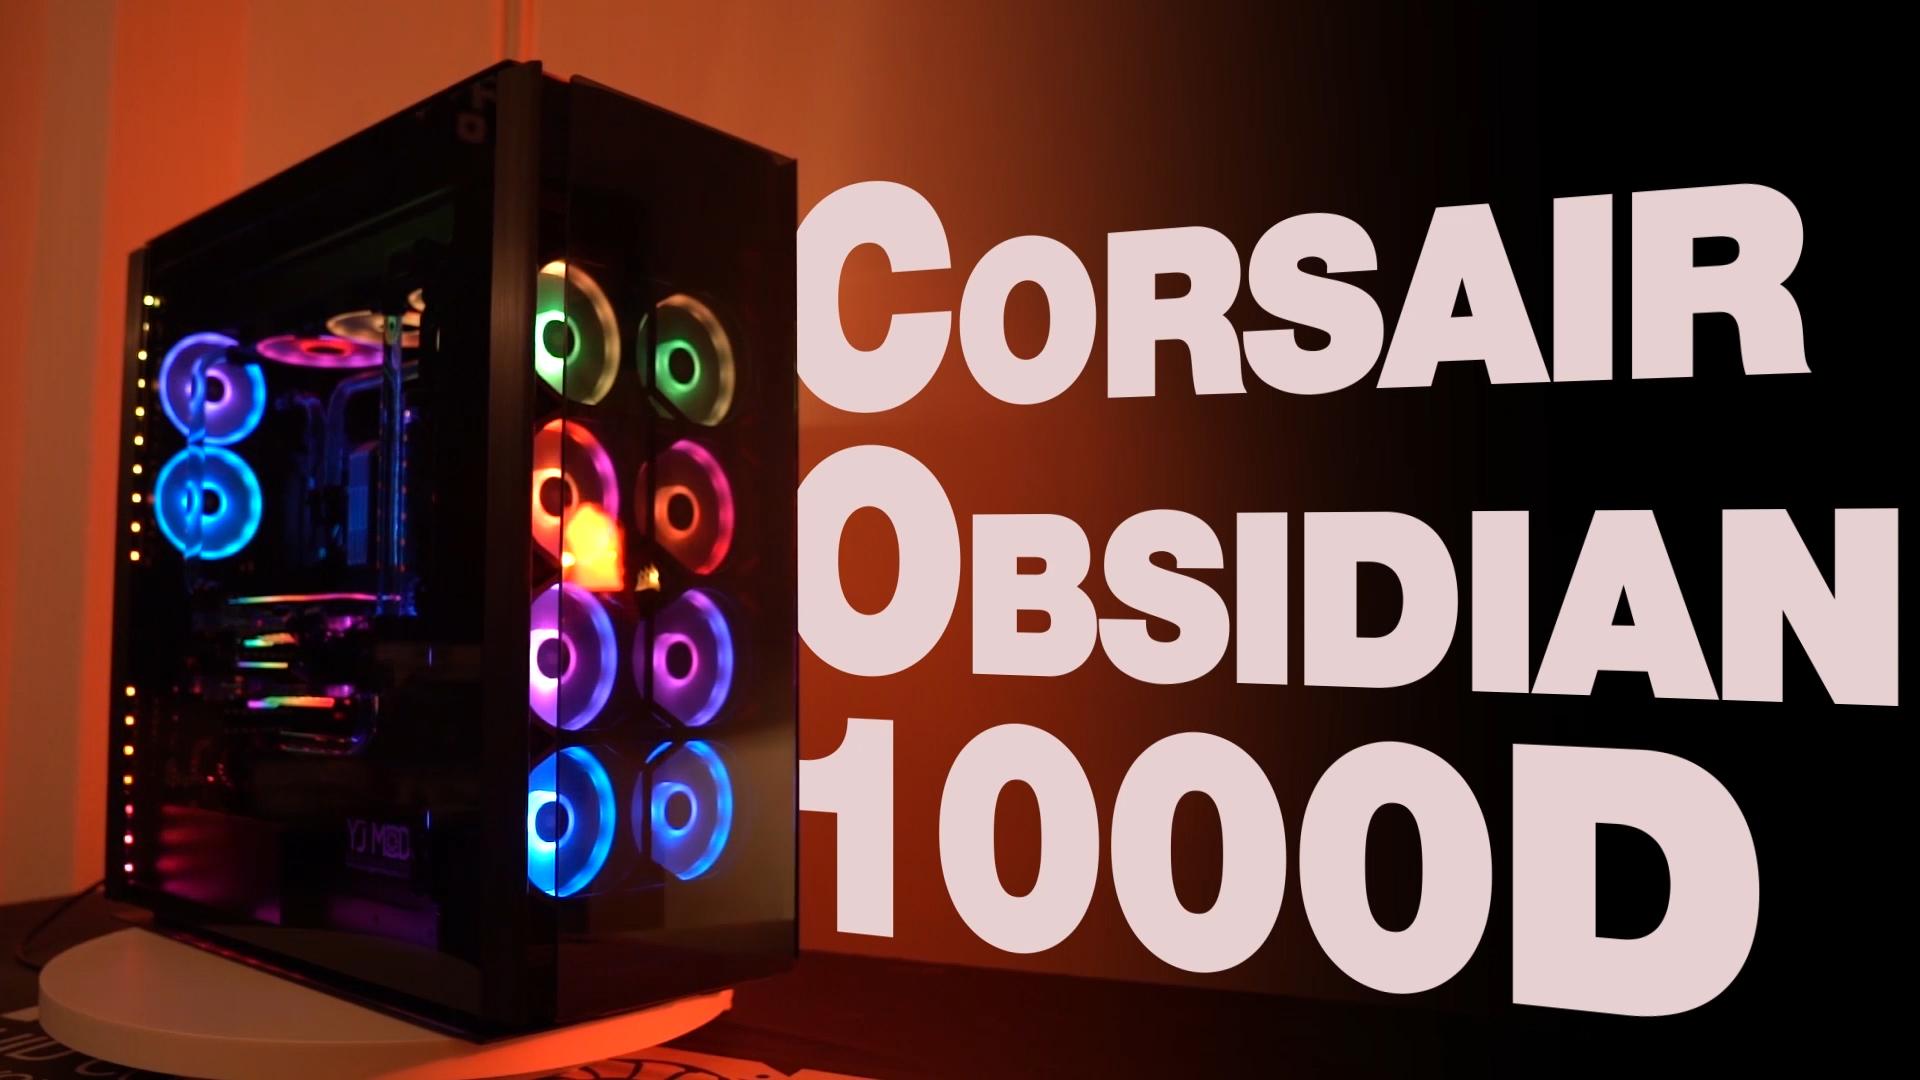 YJMOD Corsair Obsidian 1000D Review